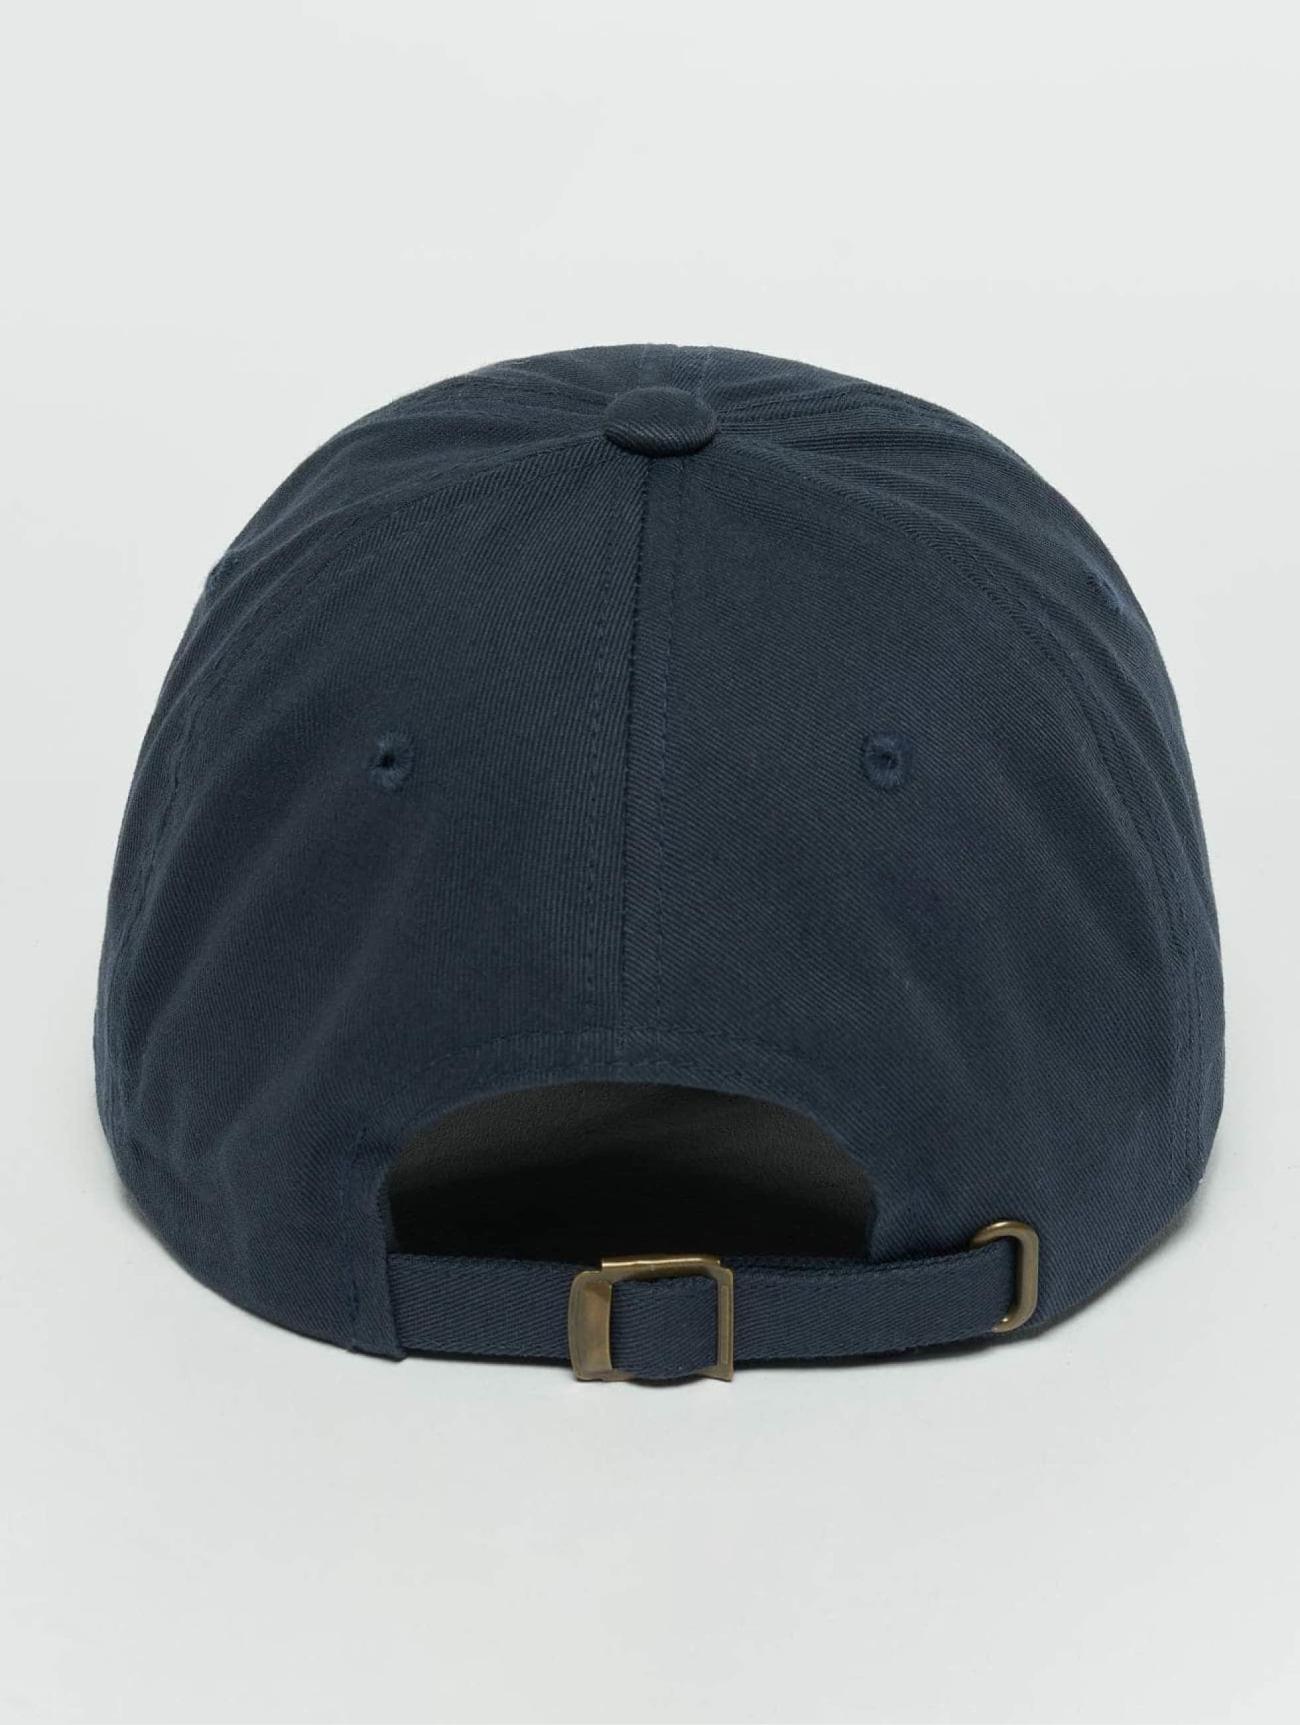 TurnUP  Never  bleu  Casquette Snapback & Strapback  522272 Homme Casquettes